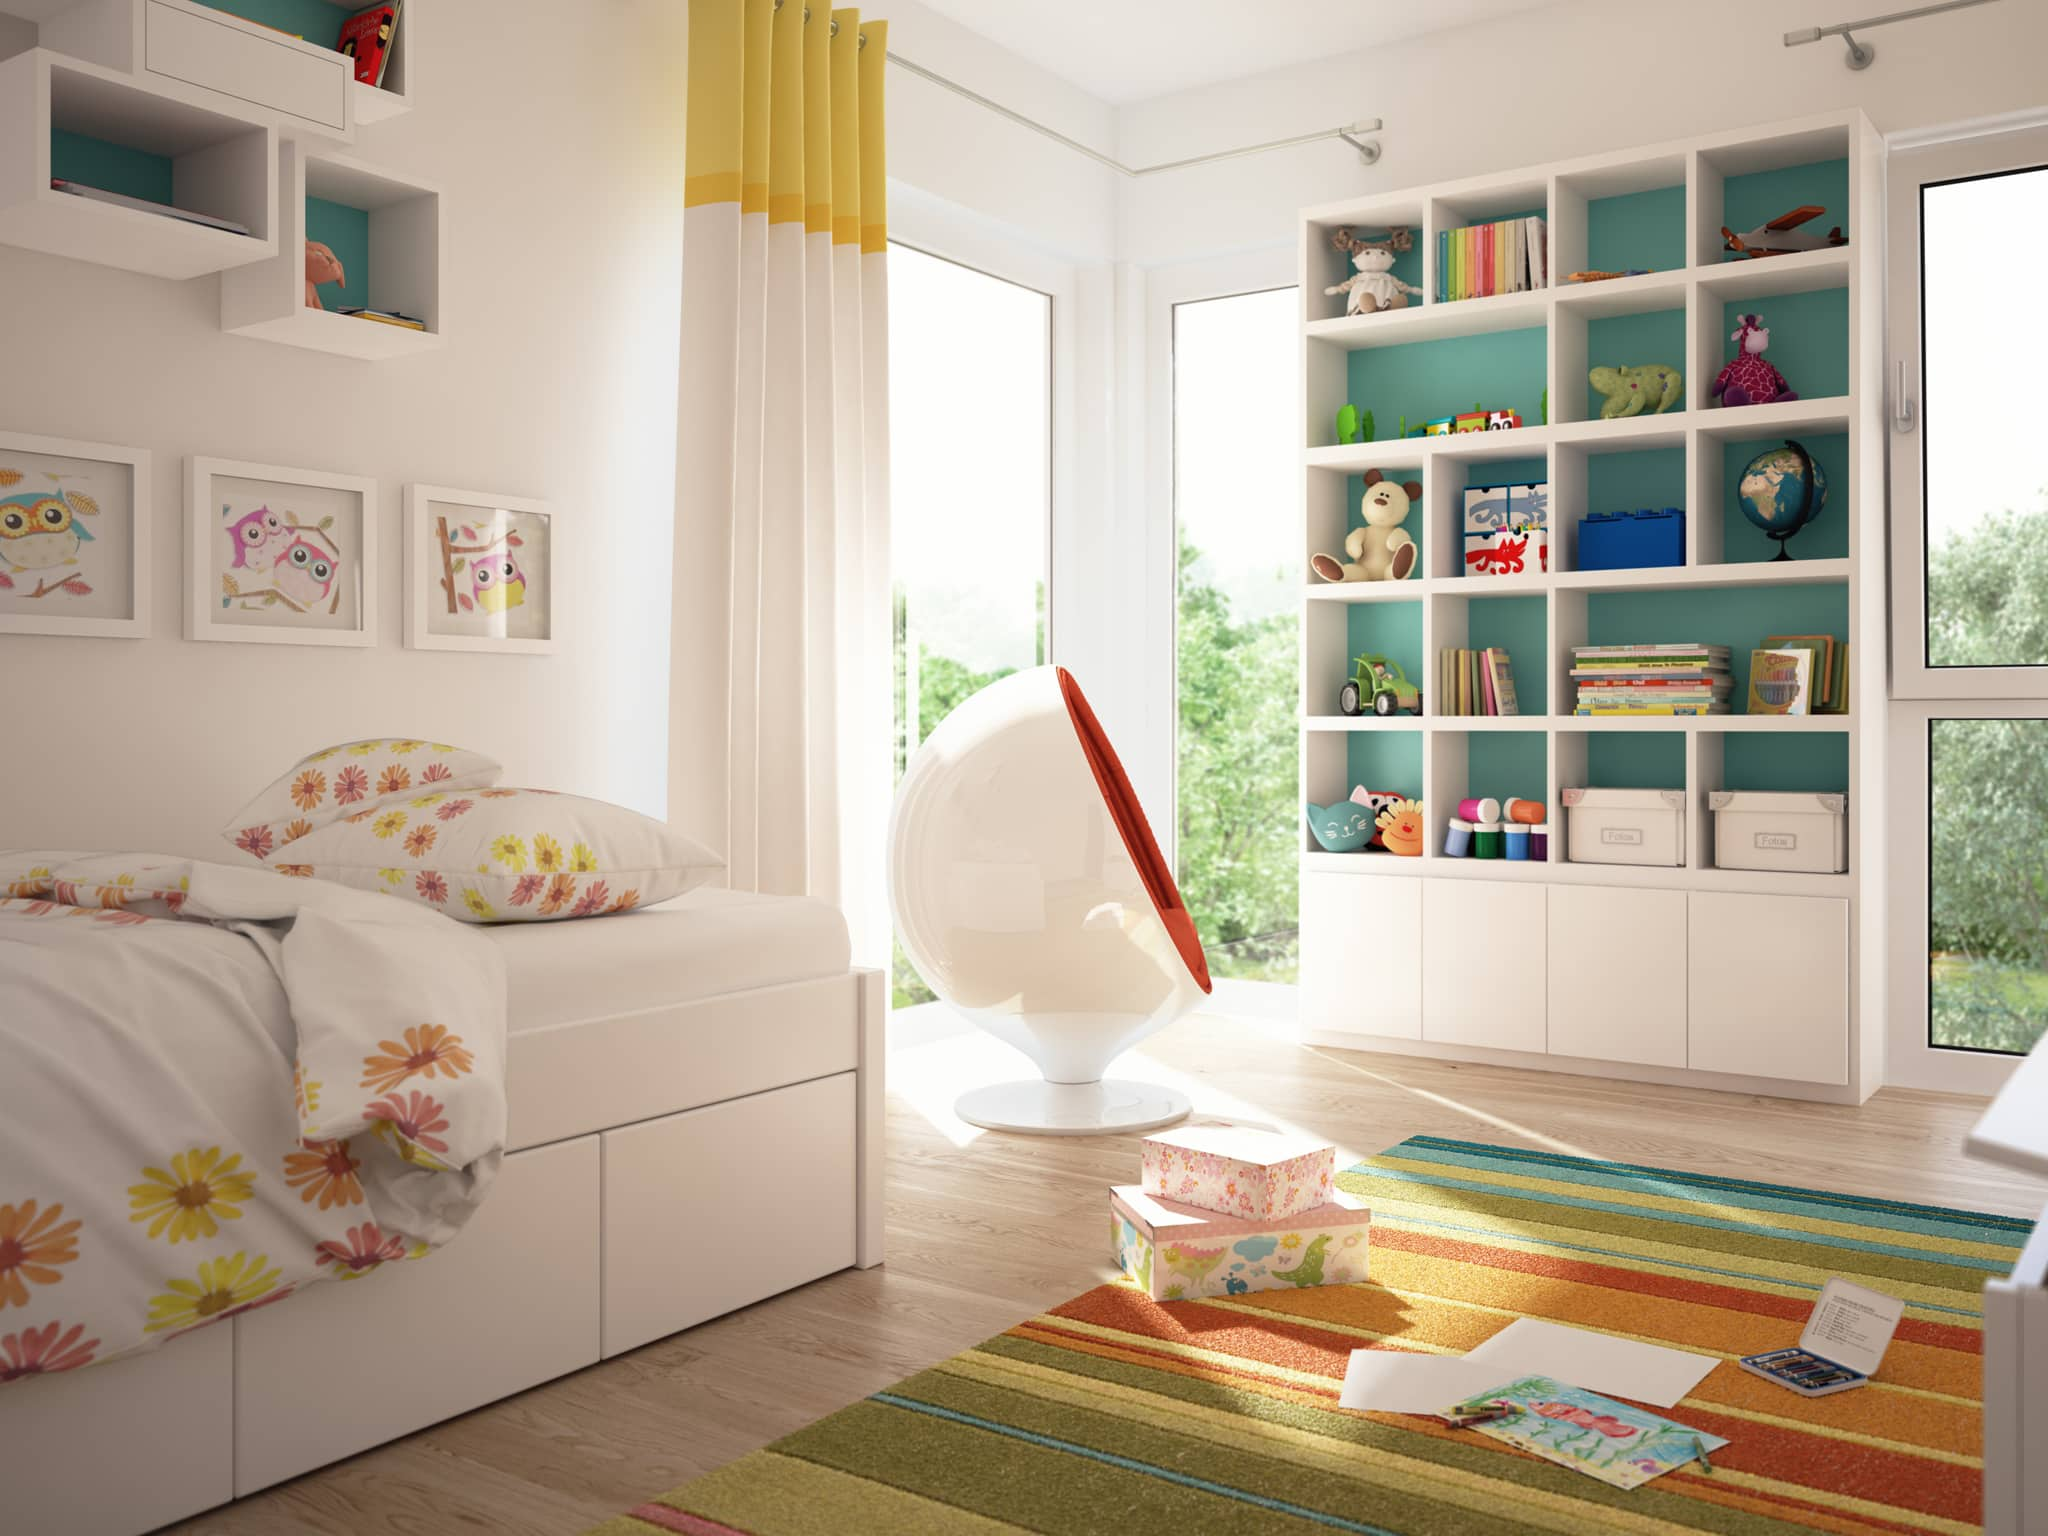 Kinderzimmer Ideen modern weiss - Inneneinrichtung Wohnideen Fertighaus Stadtvilla SUNSHINE 113 V8 von Living Haus - HausbauDirekt.de